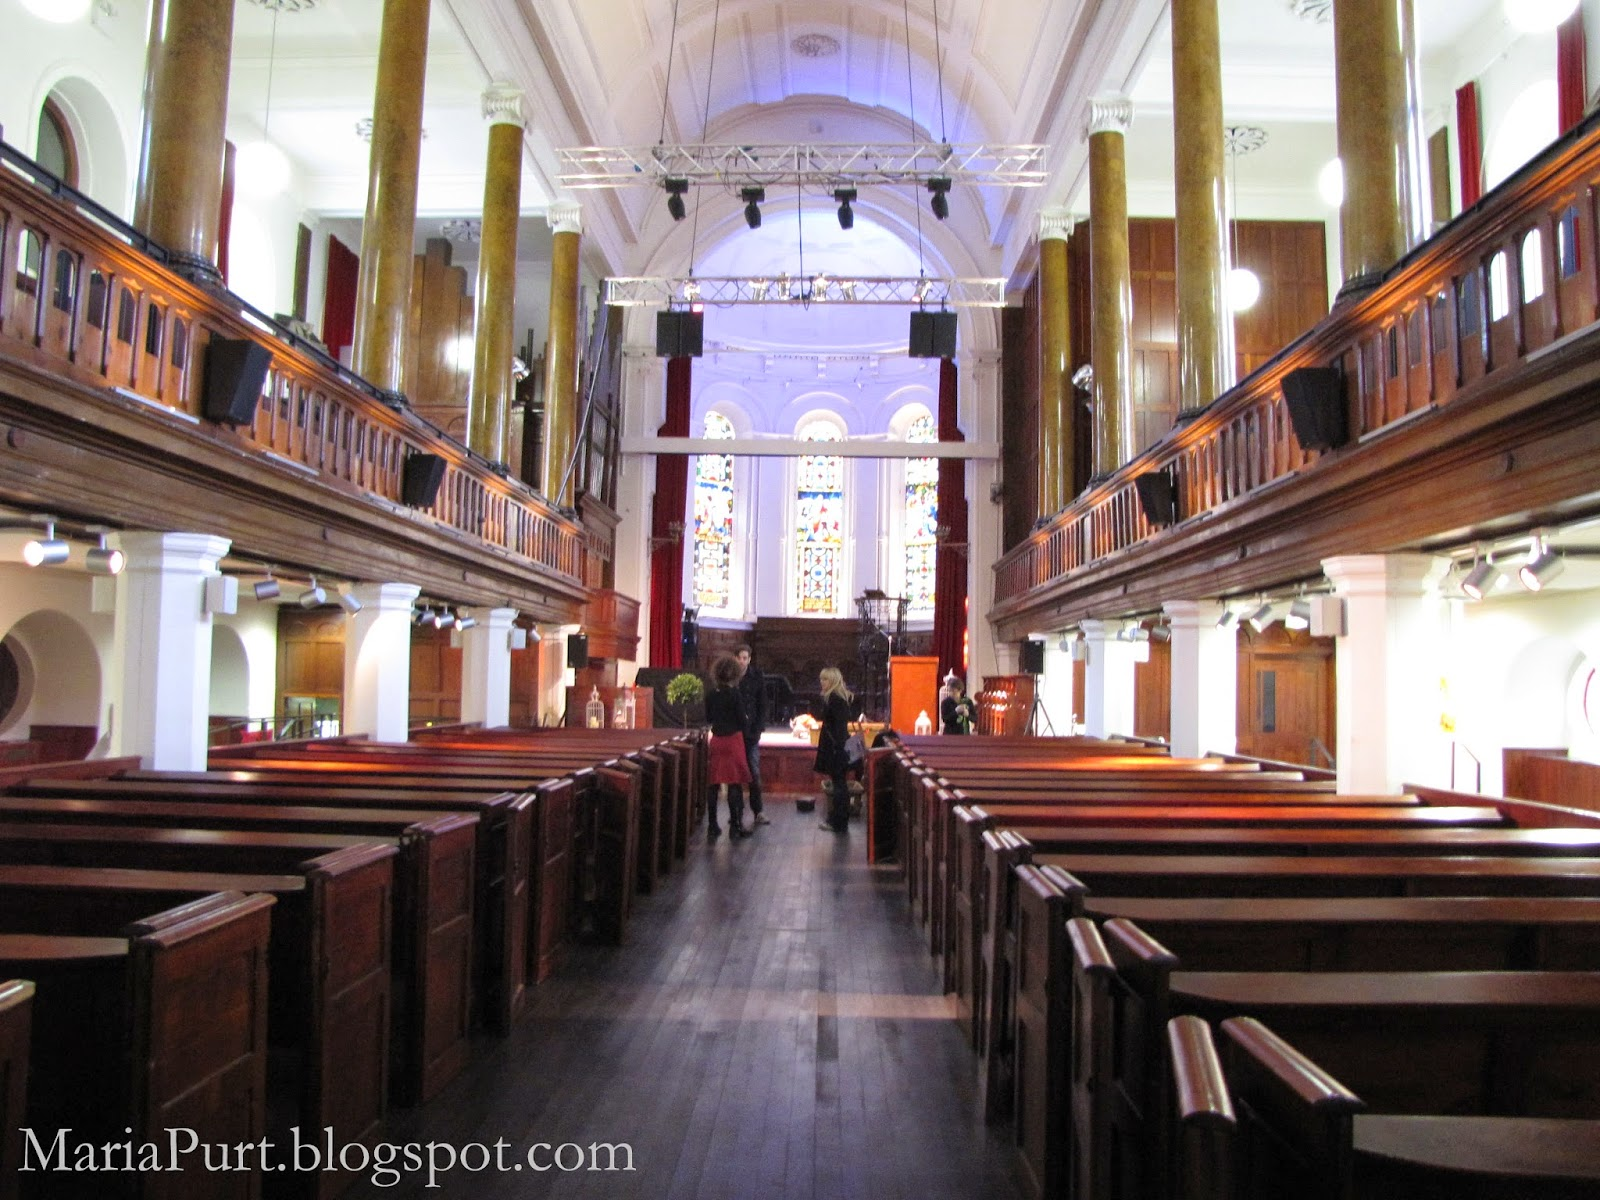 Церковь-кинотеатр, Корк, Ирландия